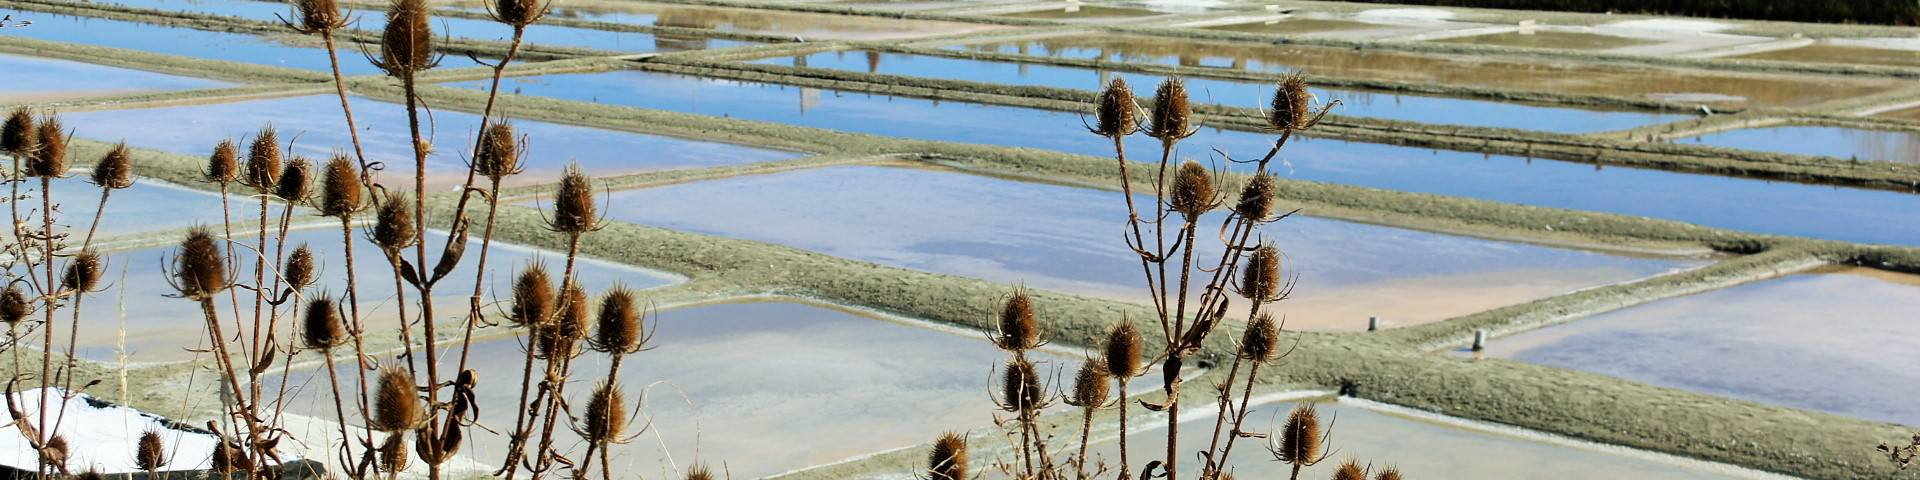 Marais Salants ©Lesley Williamson